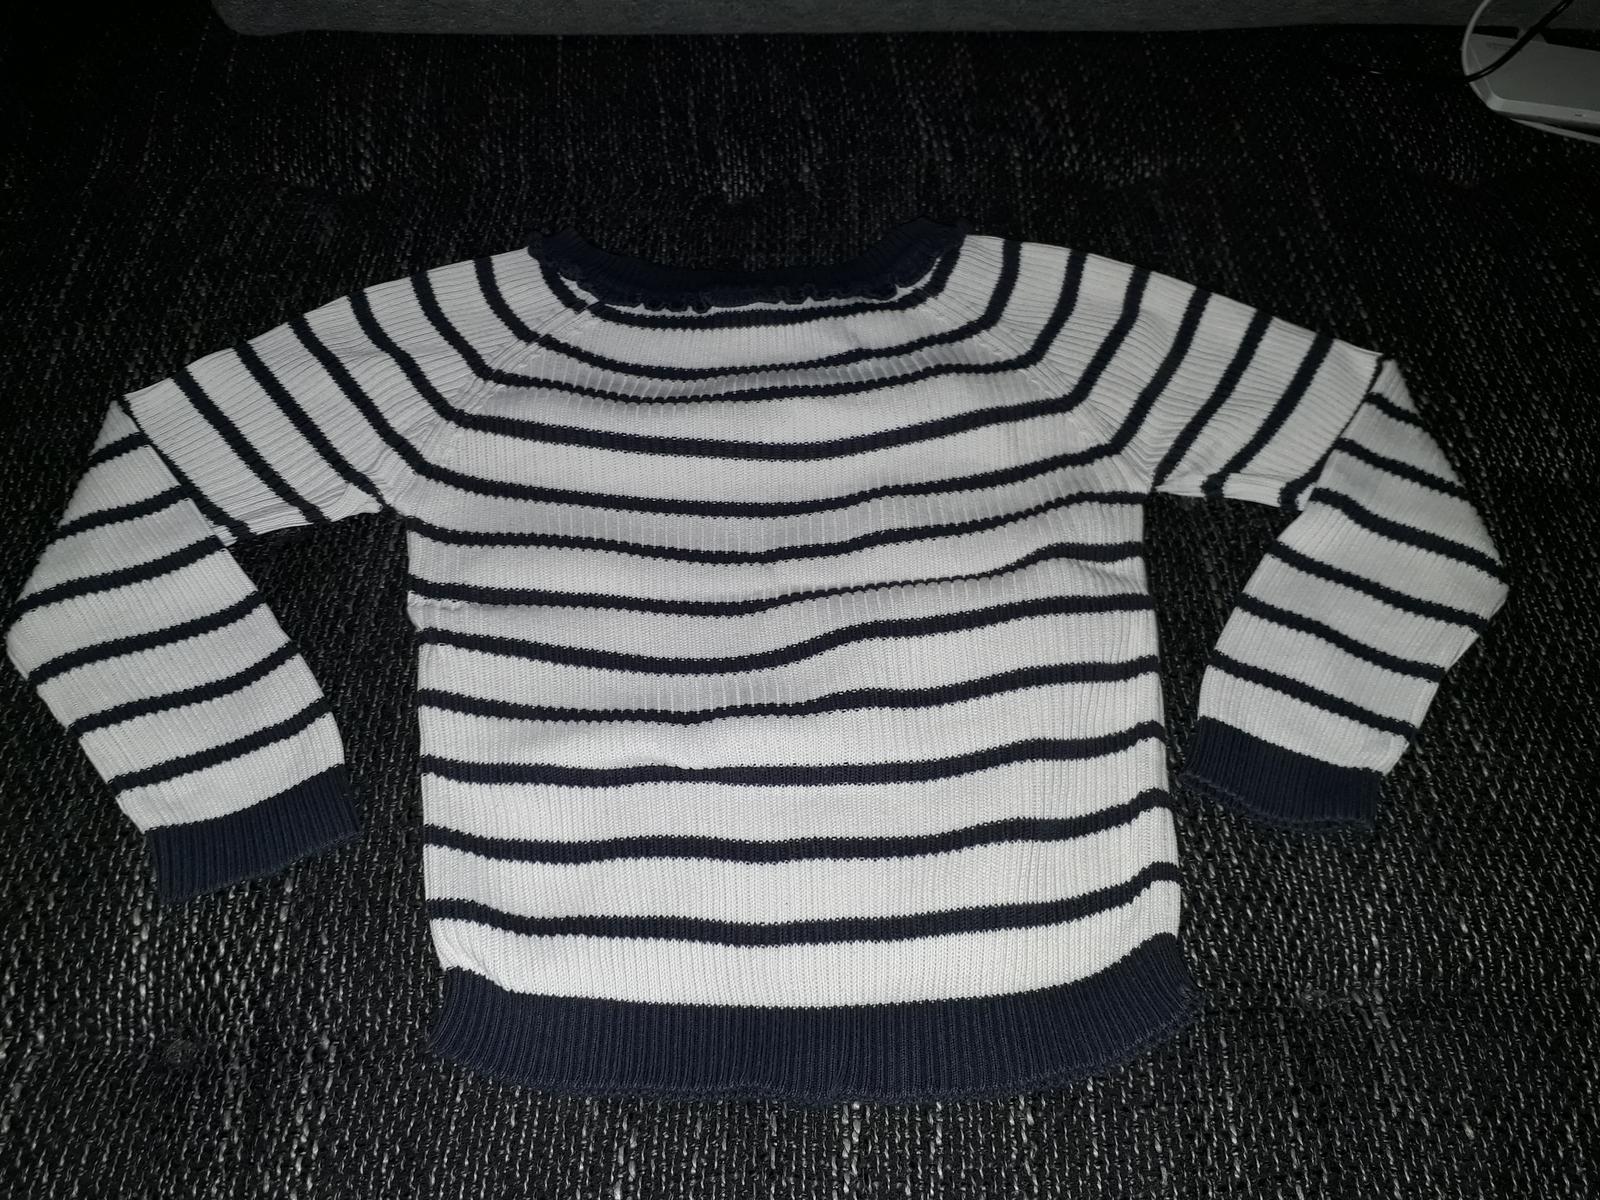 tričko/svetřík - Obrázek č. 1